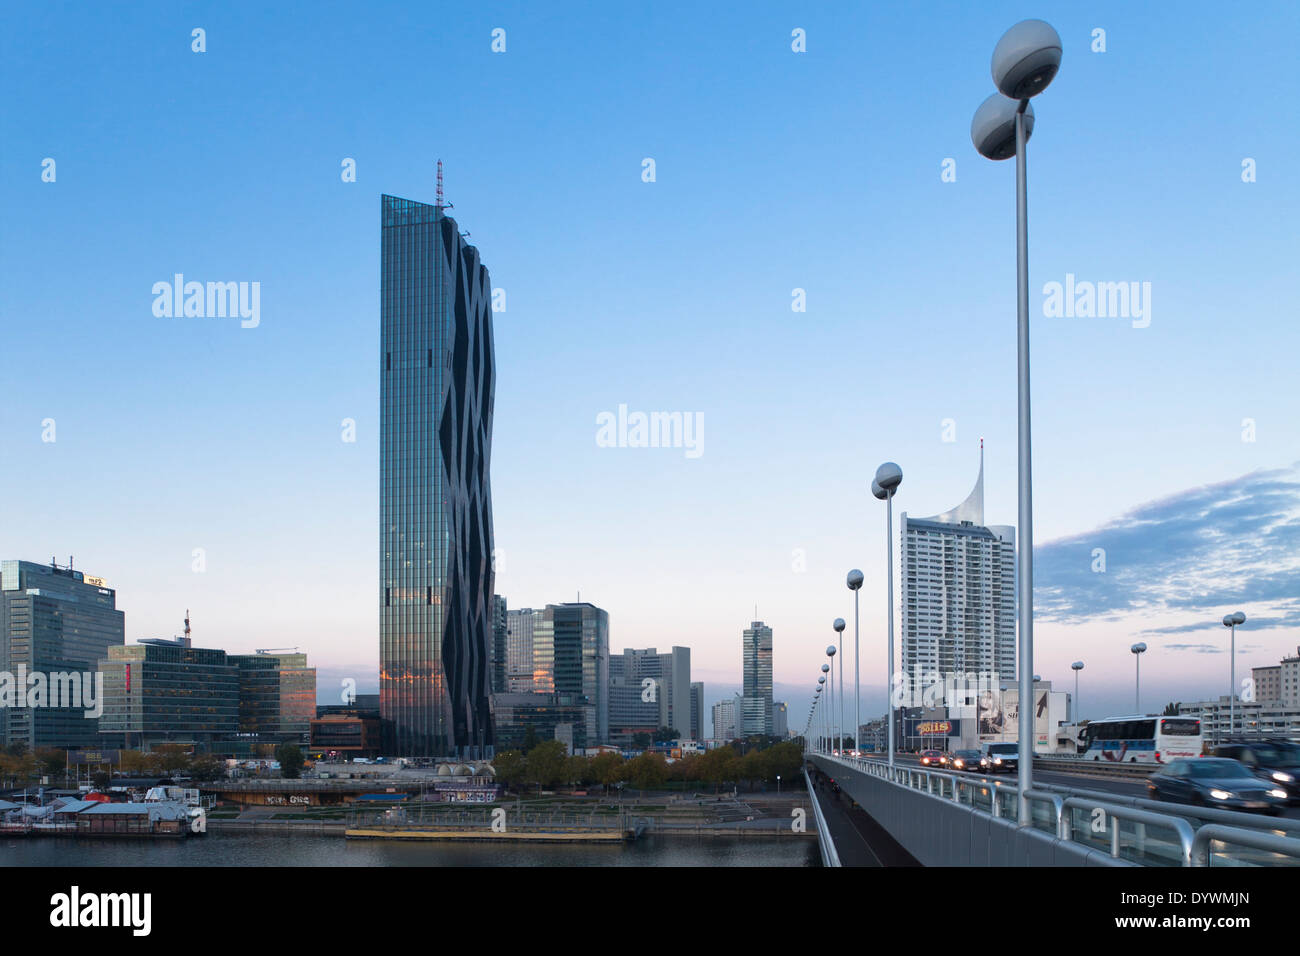 DC Tower, Danube city, Vienna, Austria - Stock Image